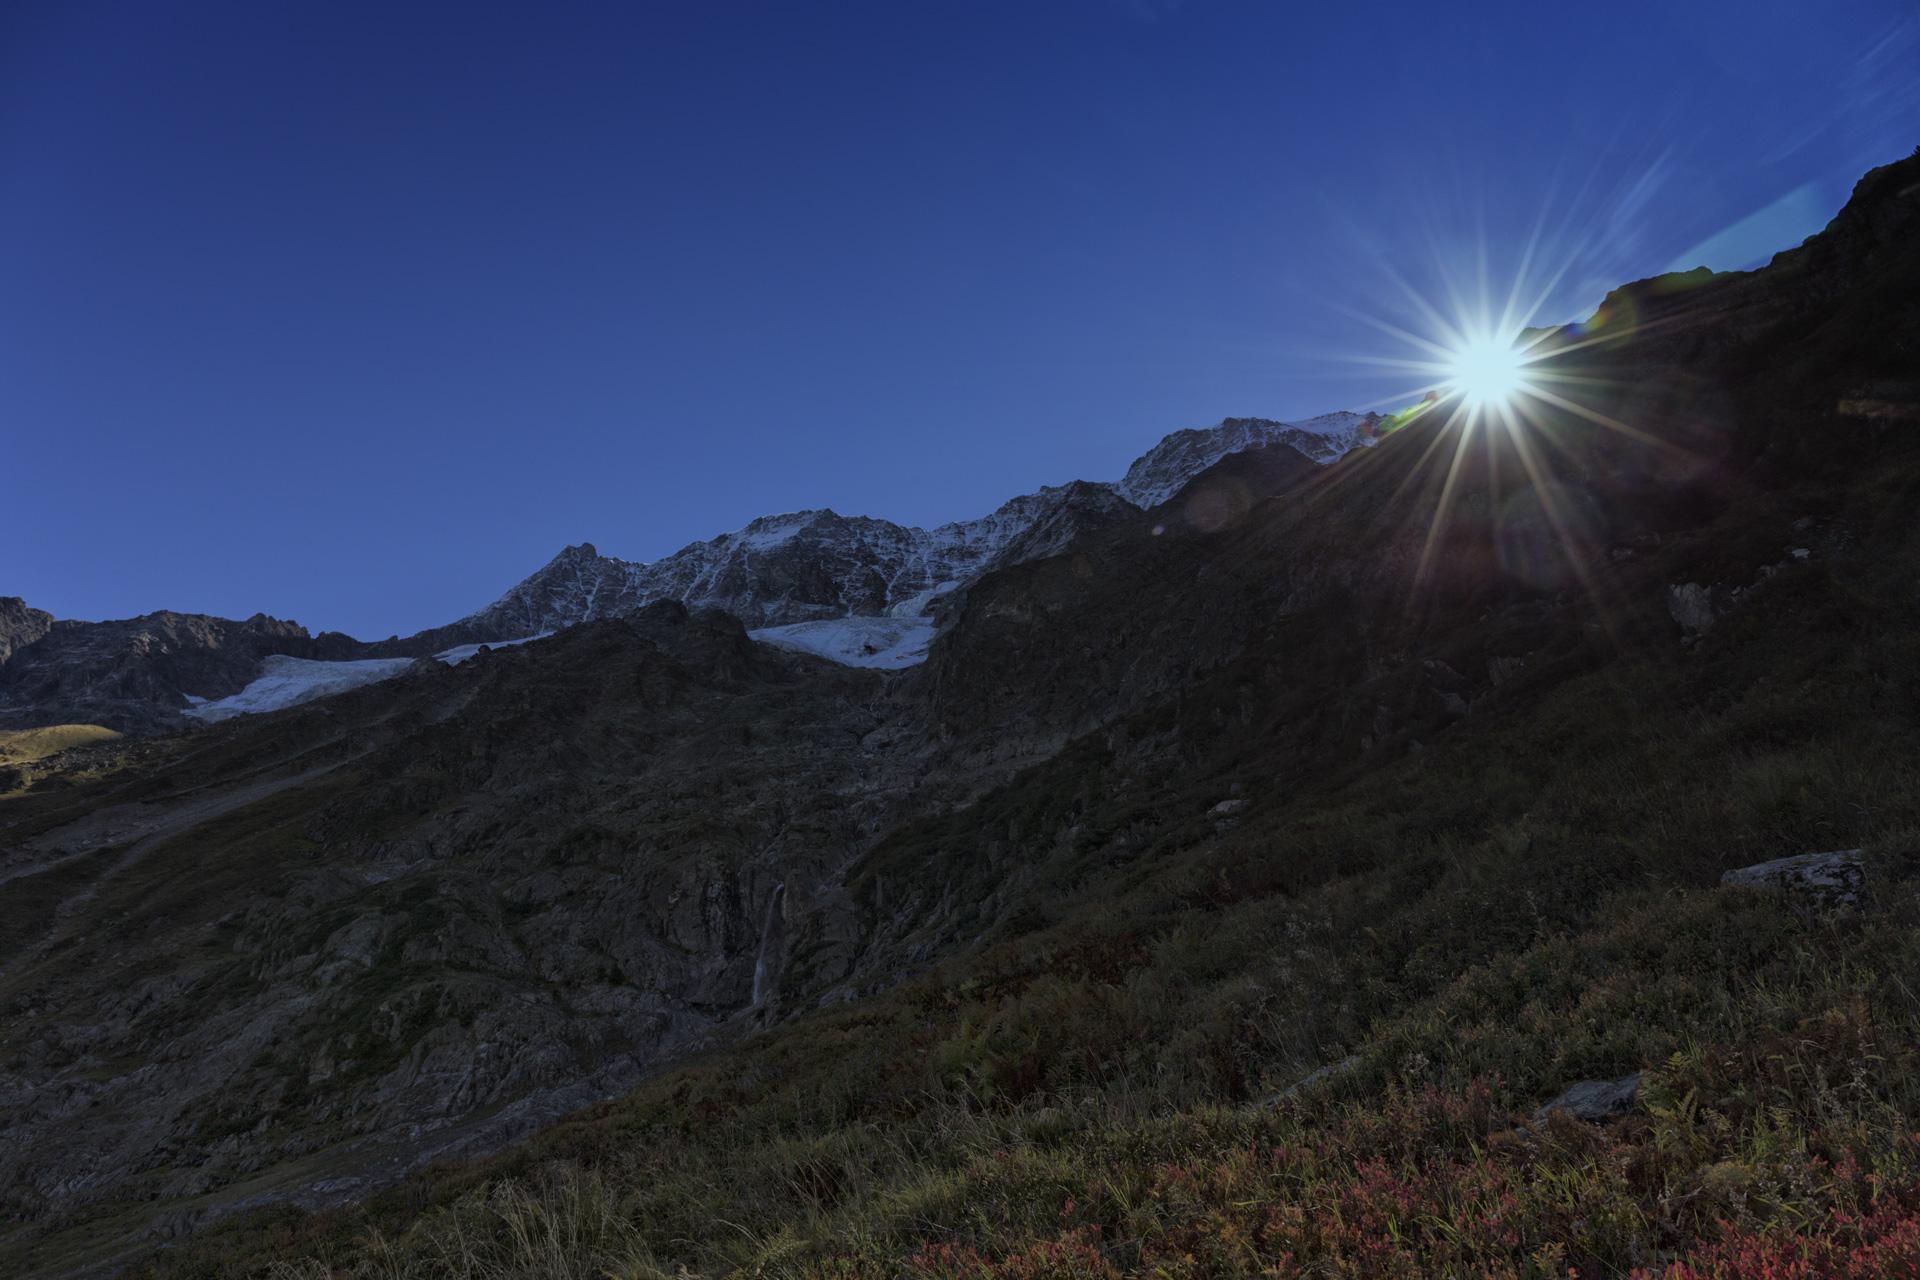 Berner-Oberland_20150921_3056-1